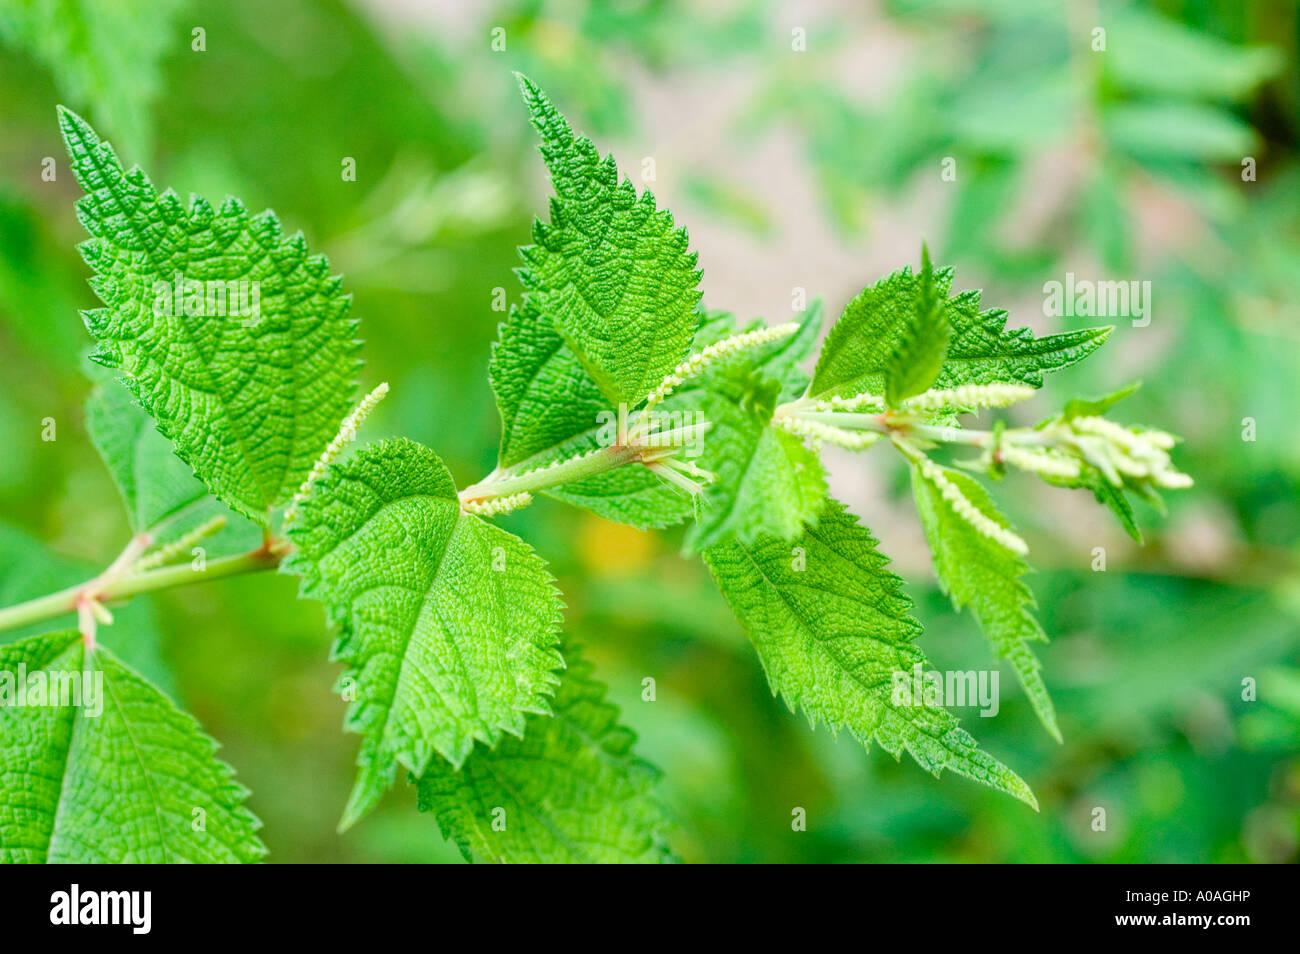 Chinese grass or Rami Urticaceae Boehmeria nivea China - Stock Image